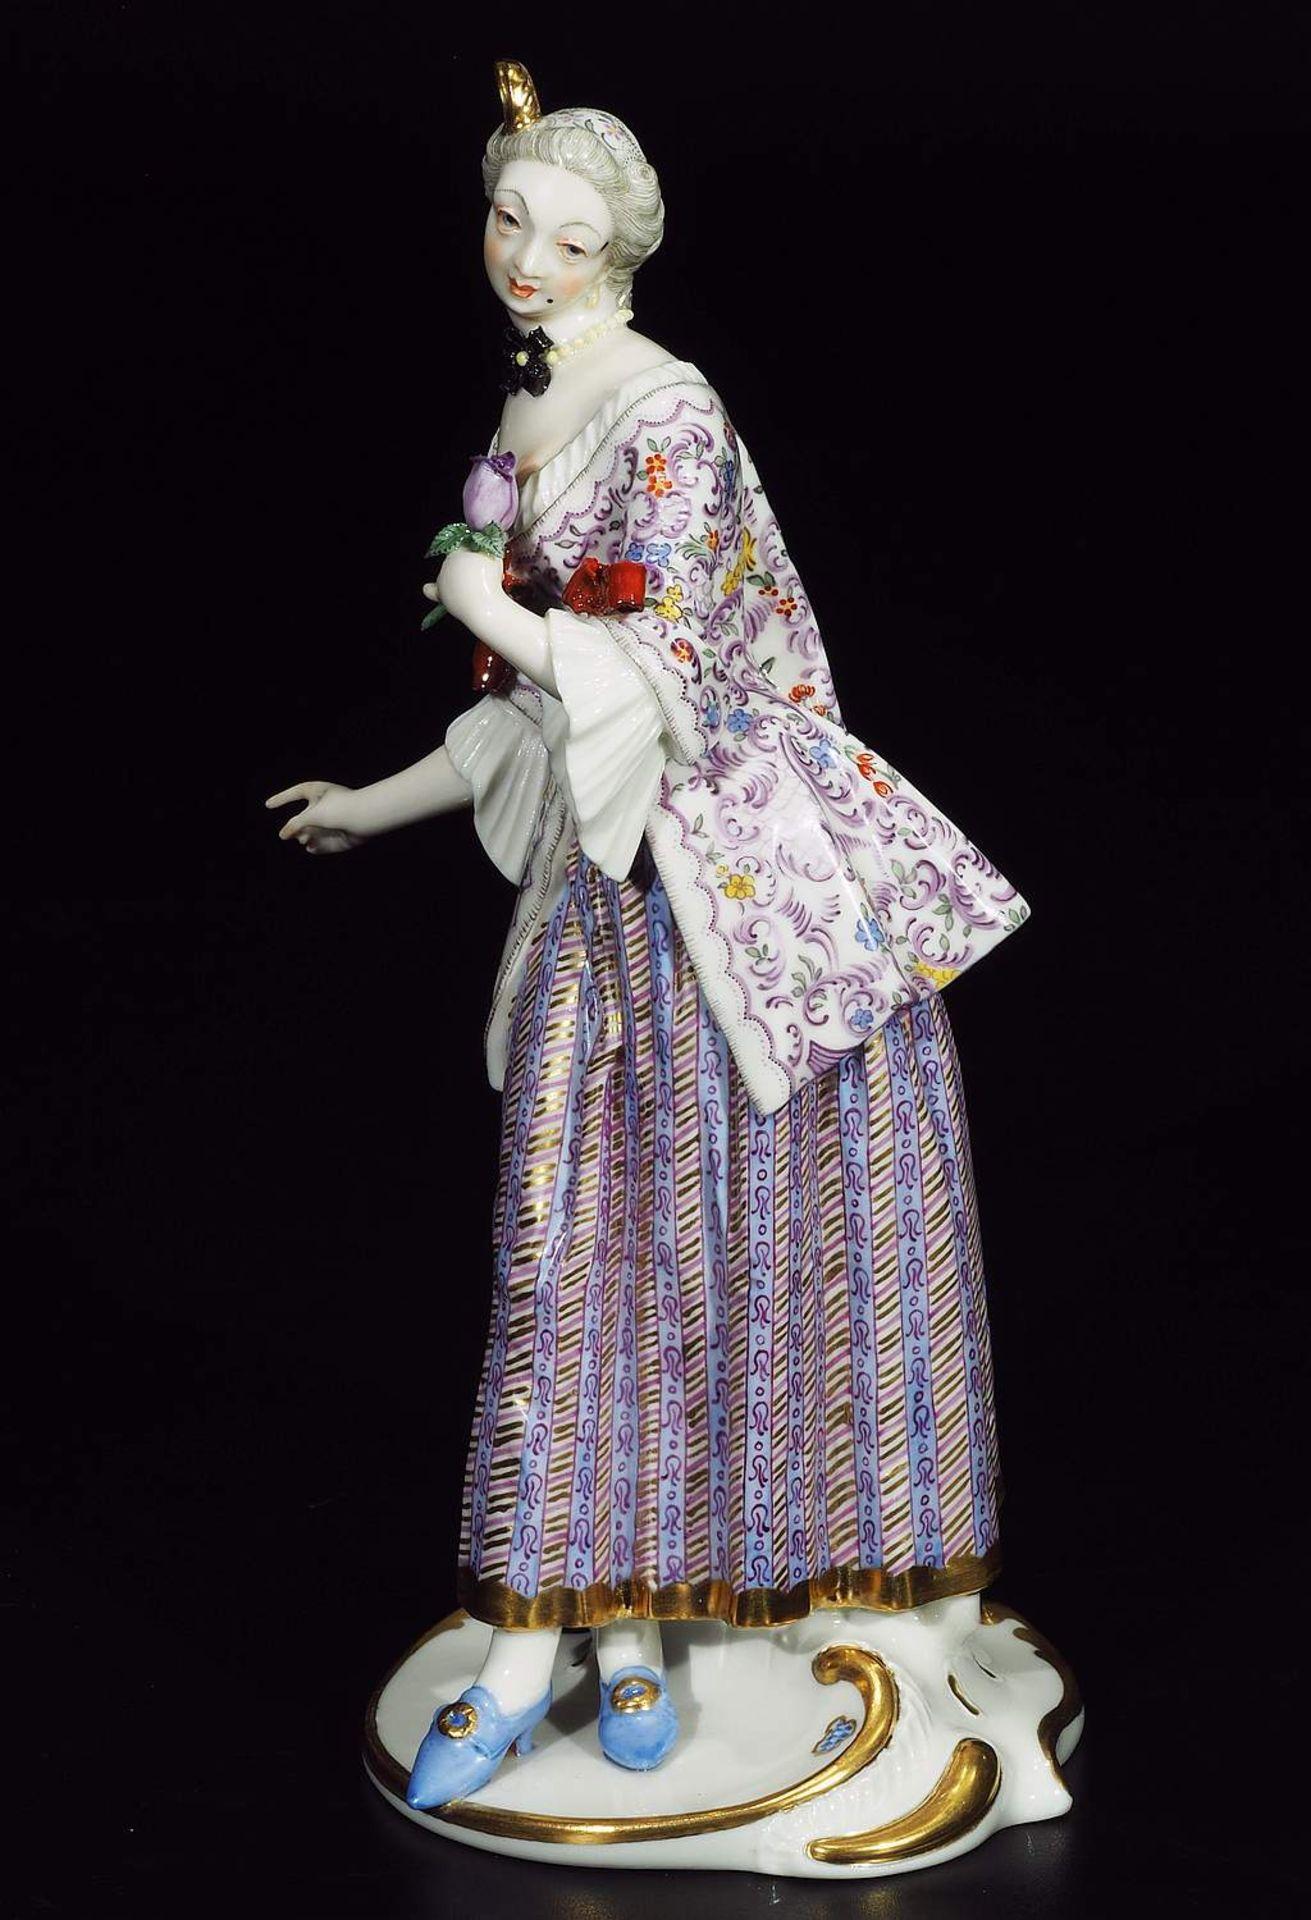 LUCINDA, Figurine der Commedia dell'Arte, NYMPHENBURG, Jahrhundert. - Image 3 of 8